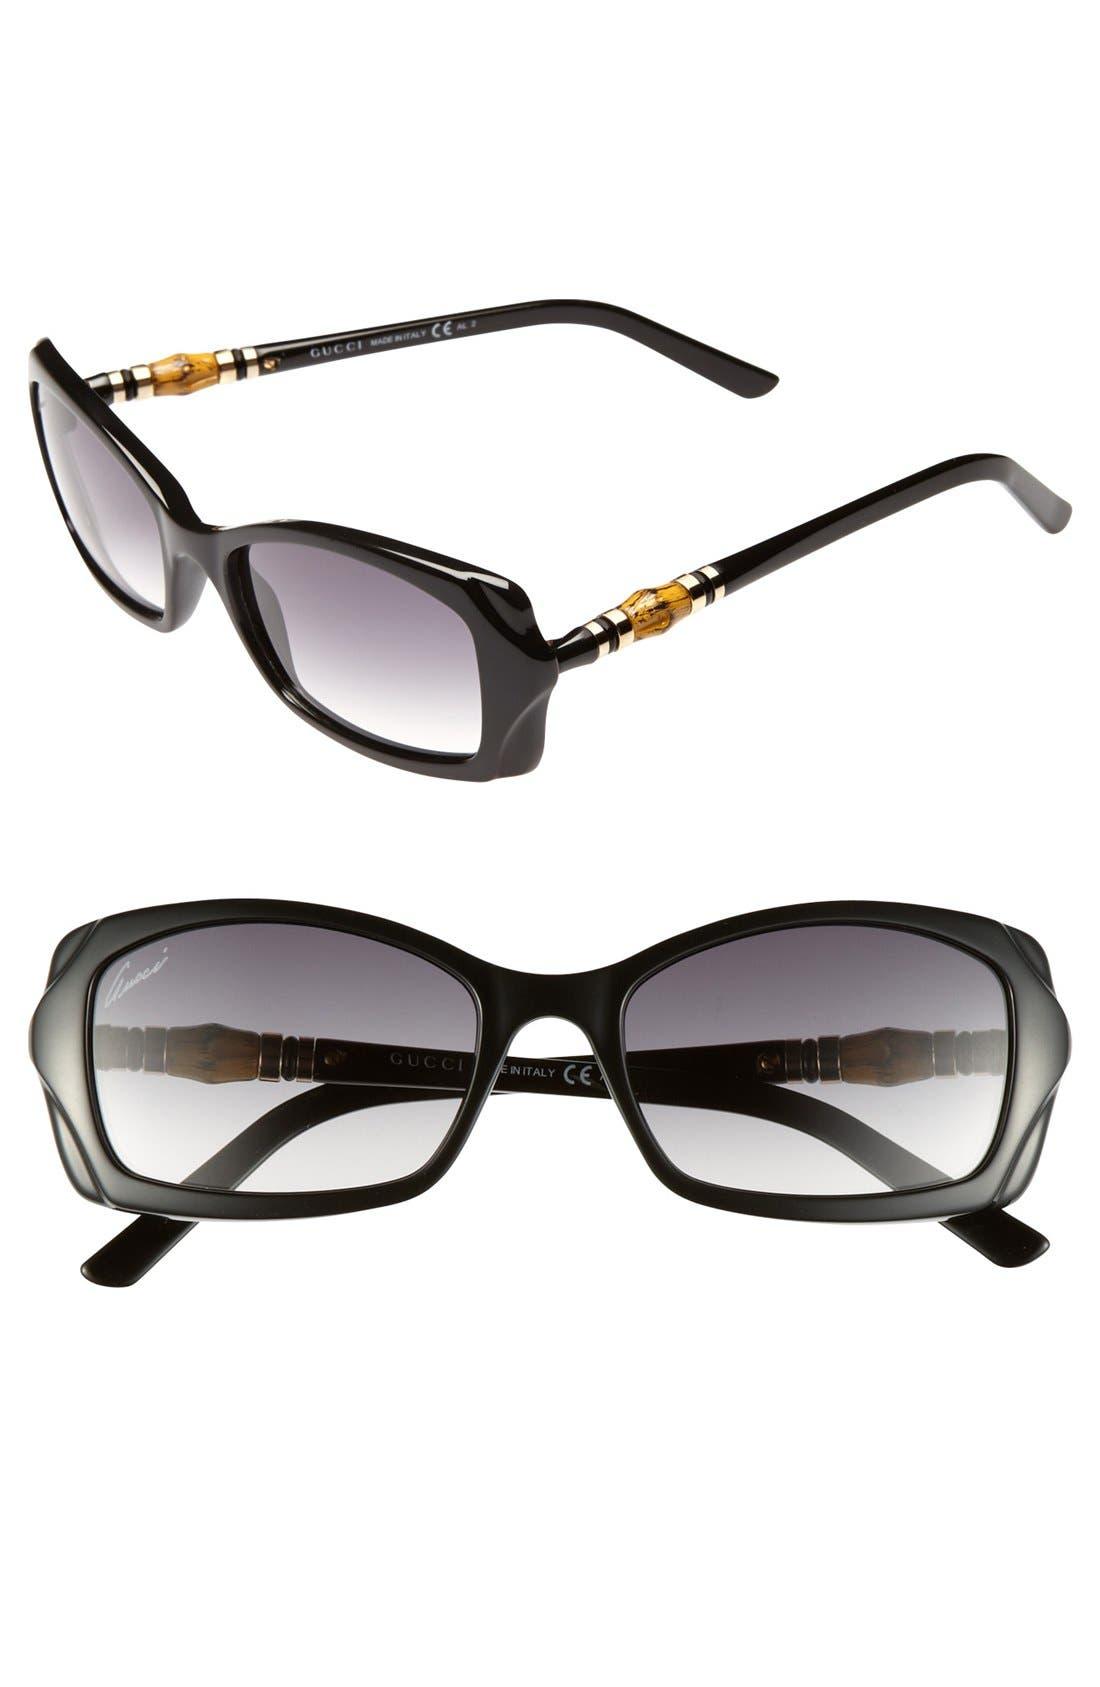 Main Image - Gucci 52mm Sunglasses